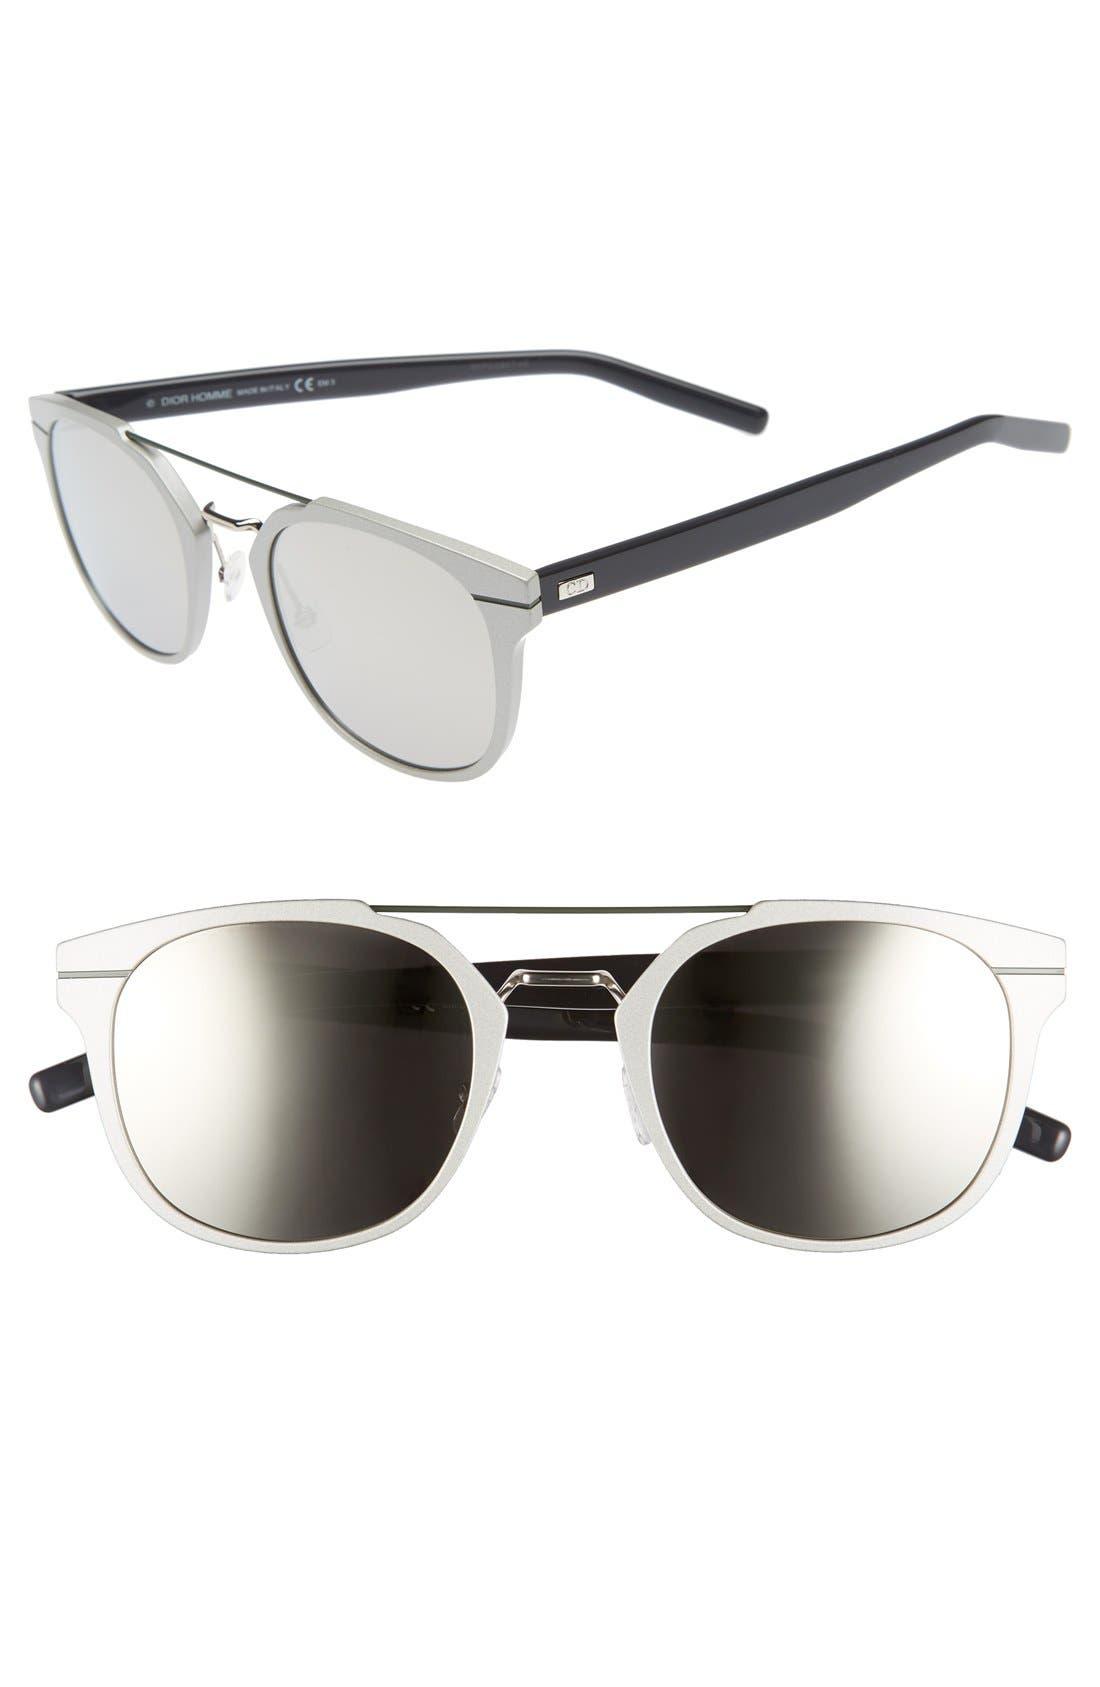 DIOR HOMME 'Al 13.5S' 52Mm Sunglasses - Metallic Silver/ Blue